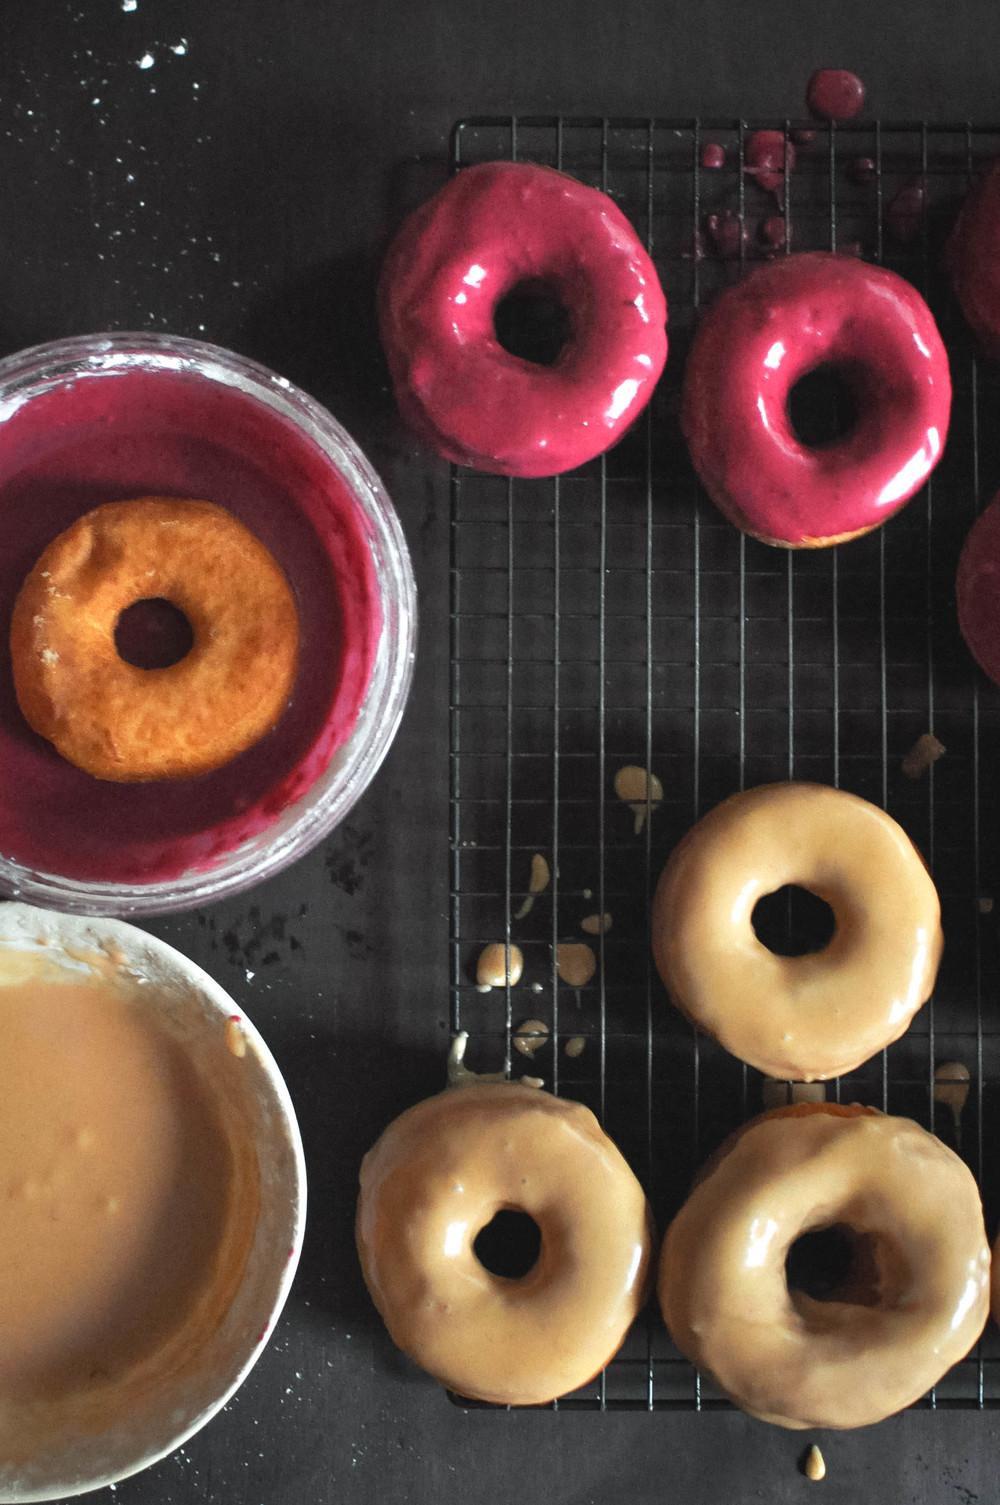 glazed_donuts6.jpg